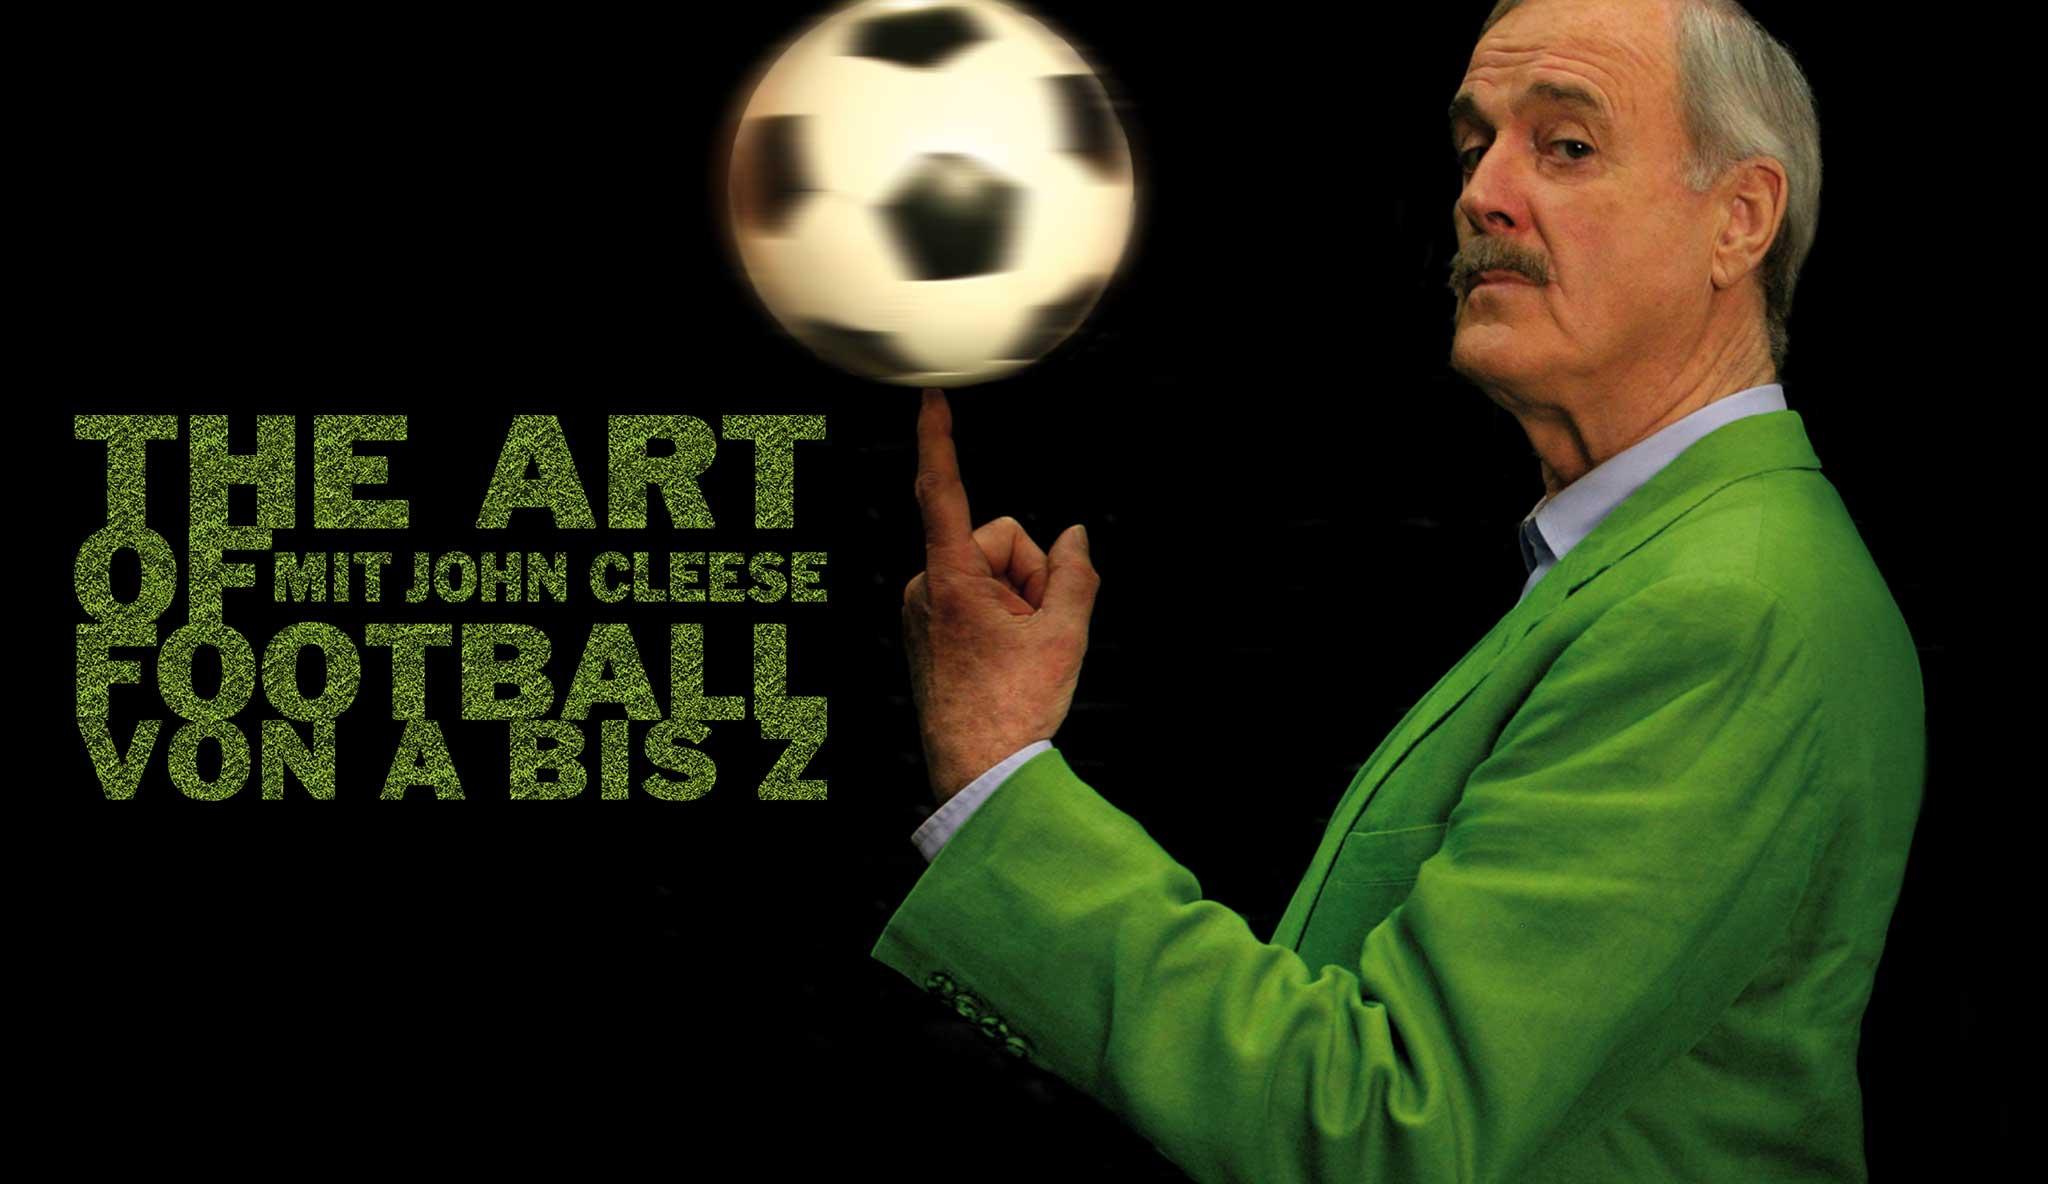 the-art-of-football-fusball-von-a-z\header.jpg